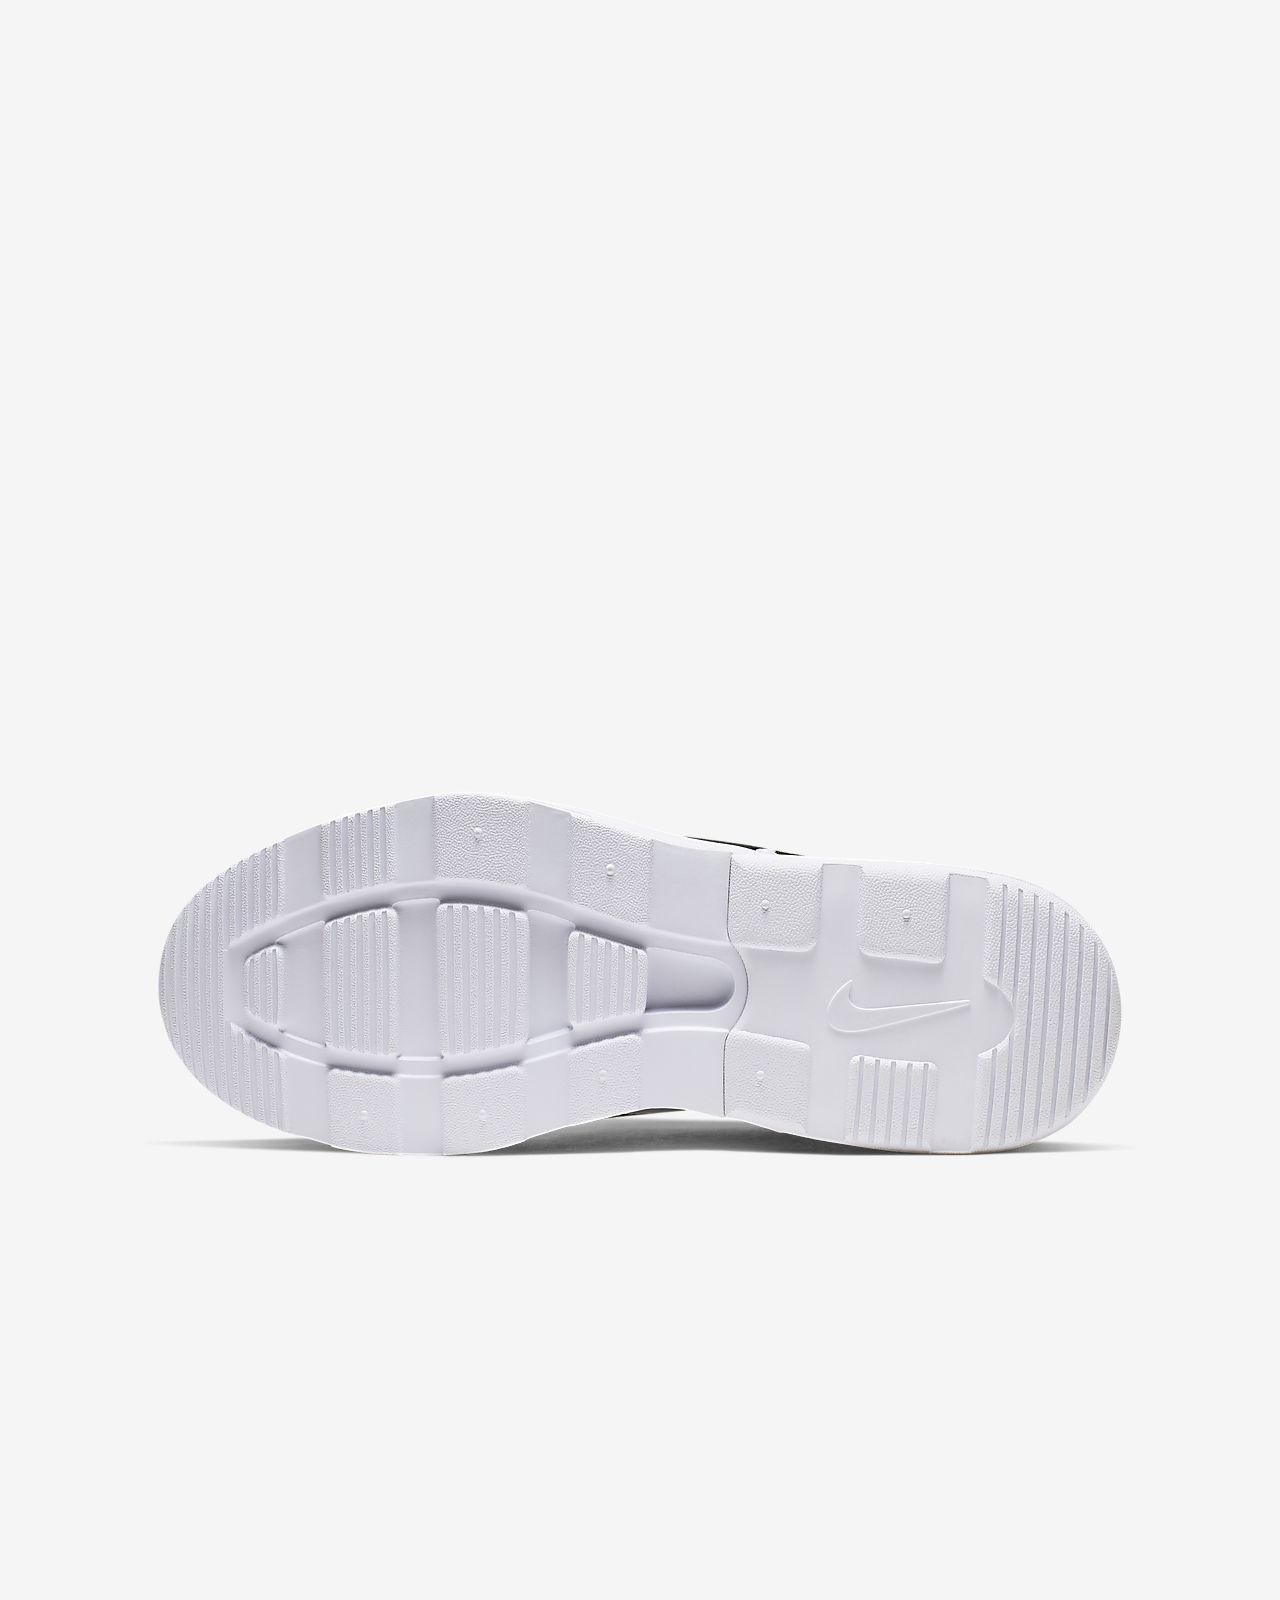 Nike Air Max Motion 2 Schuh für ältere Kinder